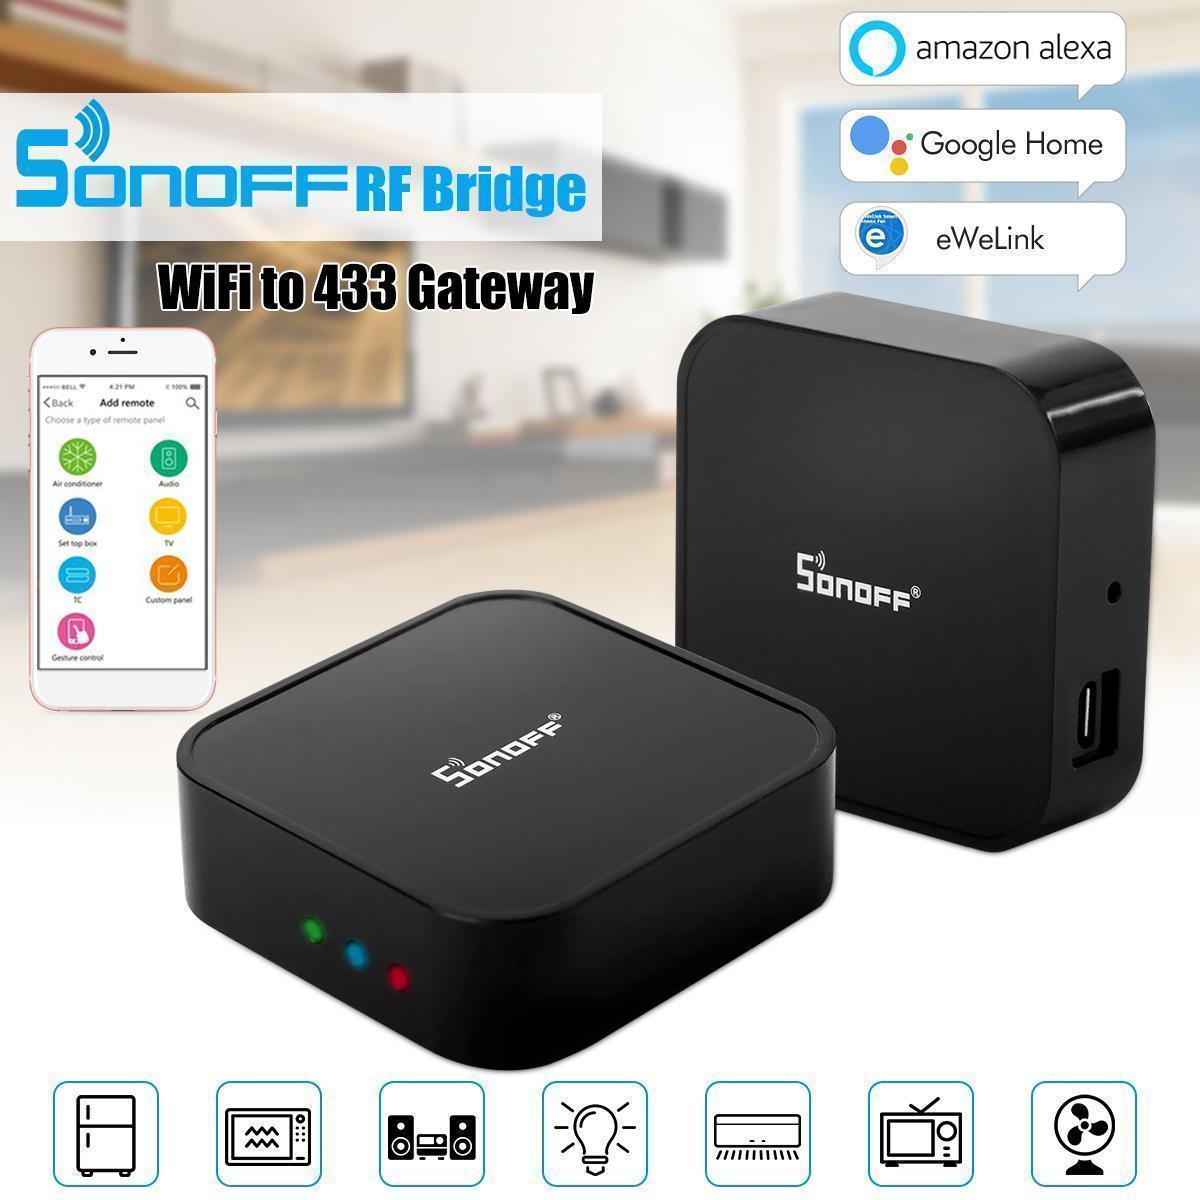 Sonoff RF Bridge 433MHz Wifi Smart Switch Voice Control App Remote  Controller